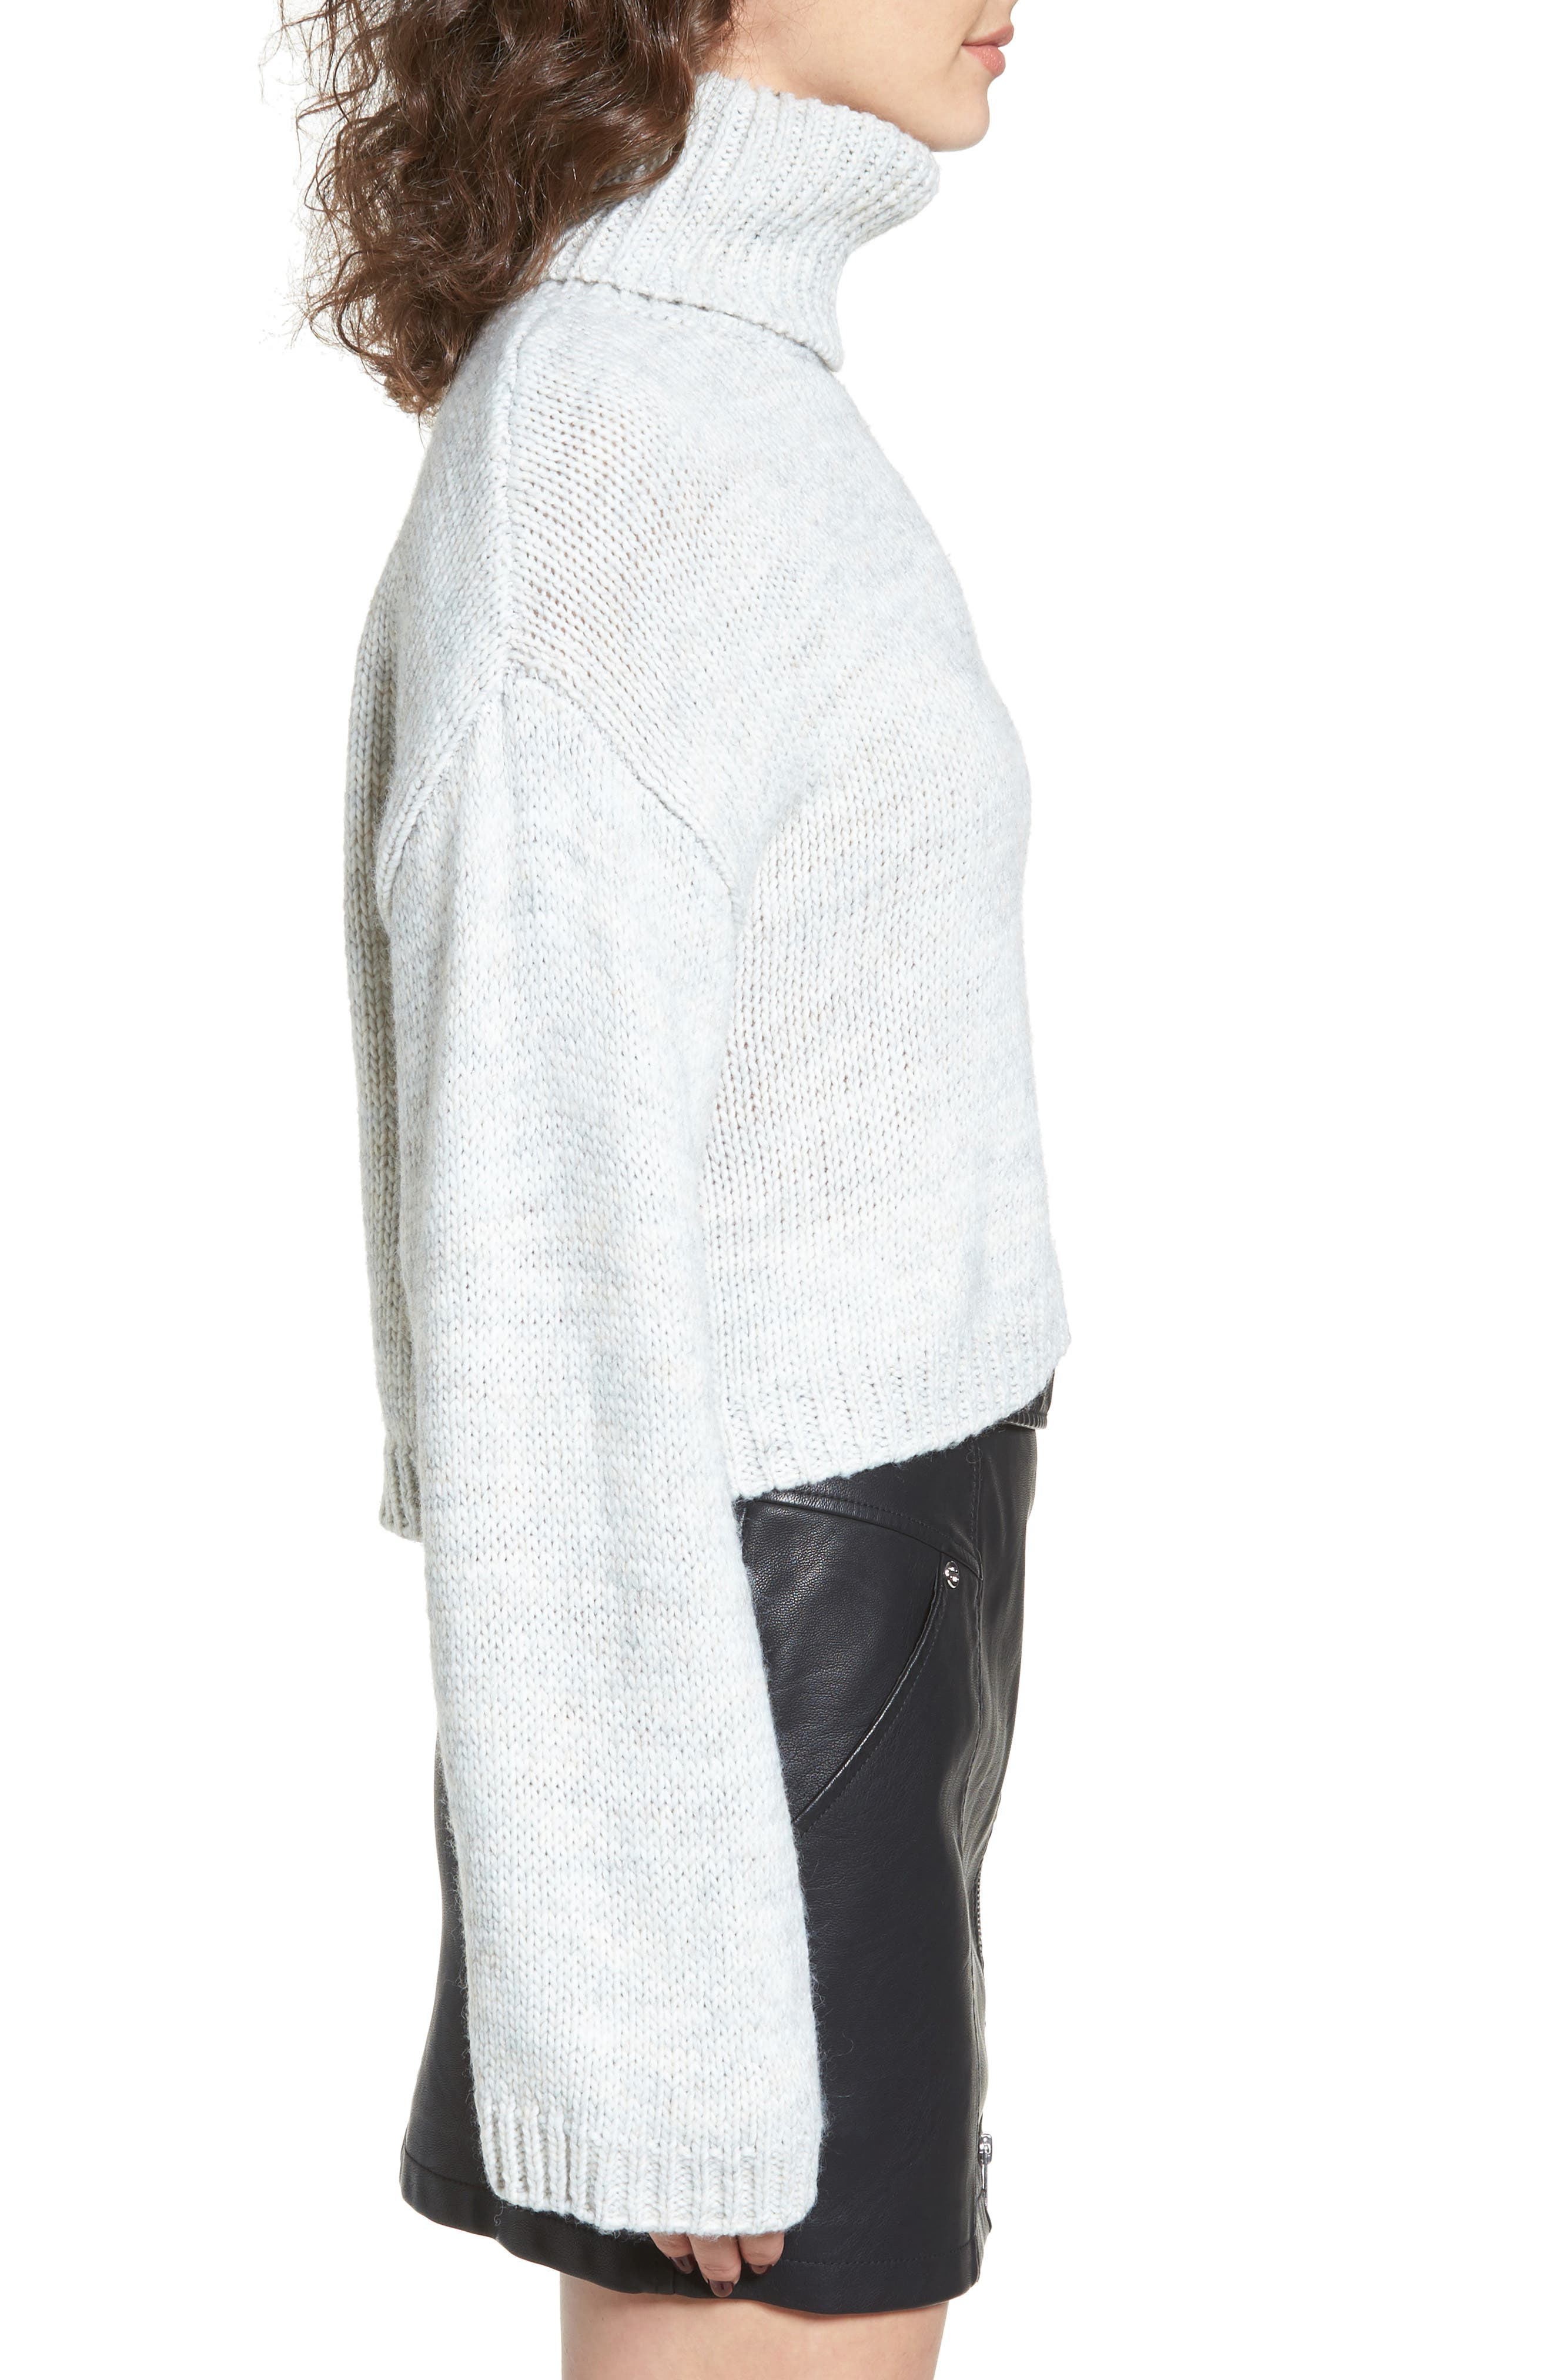 Skelter Turtleneck Sweater,                             Alternate thumbnail 3, color,                             Heather Grey